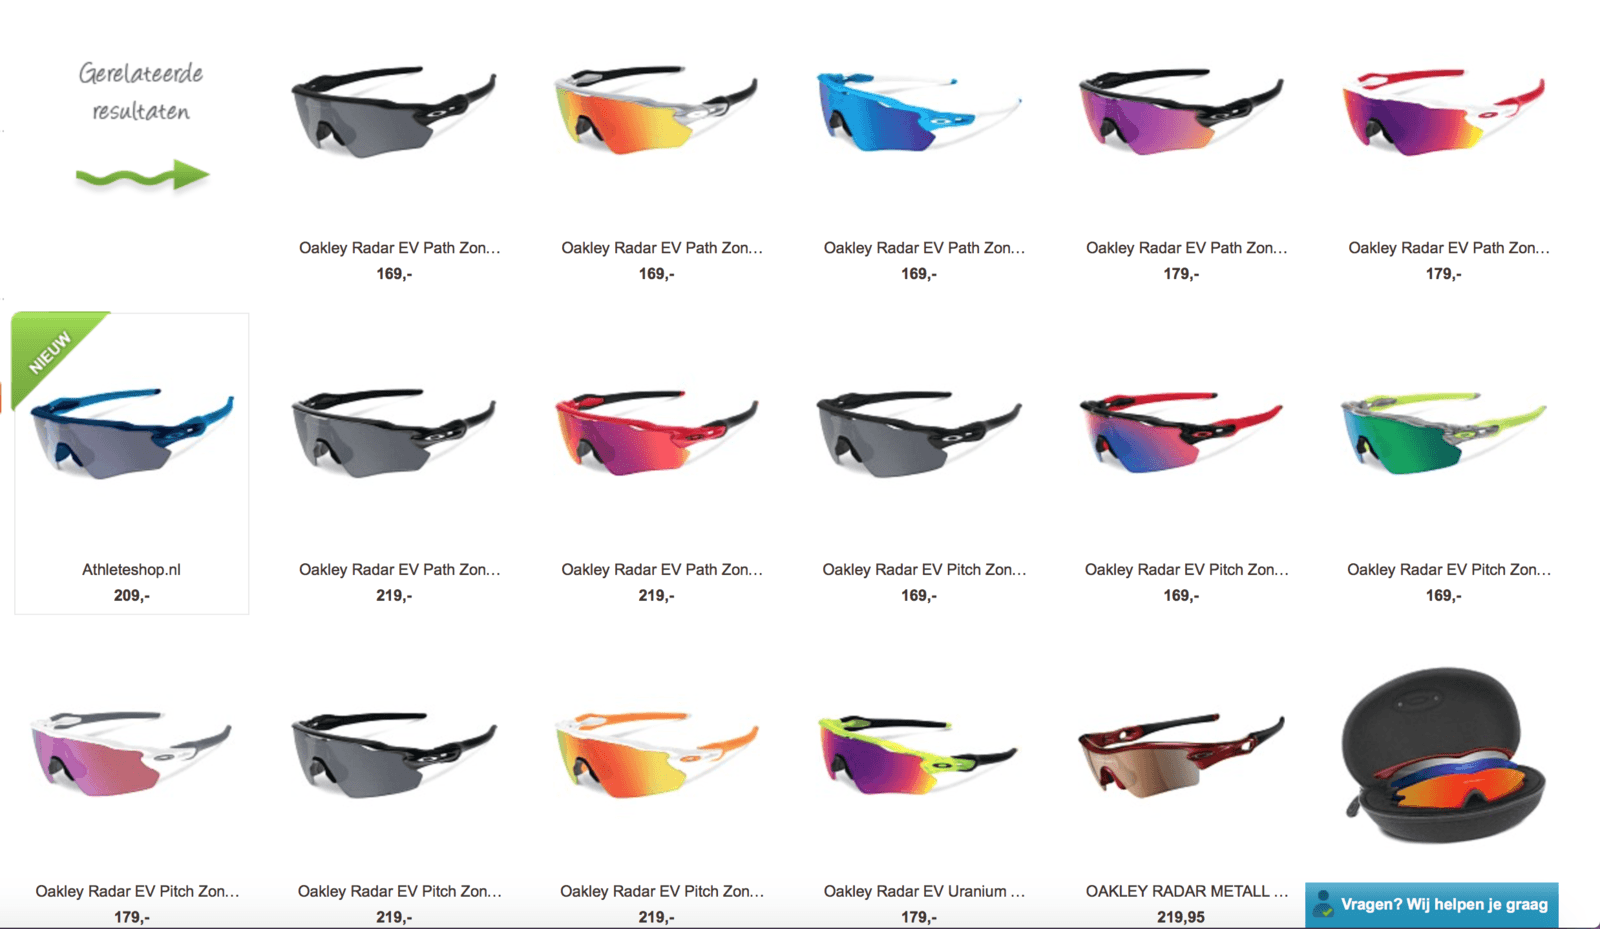 Full Radar EV colour options (photos+website link) - Screen Shot 2015-03-05 at 20.50.55.png